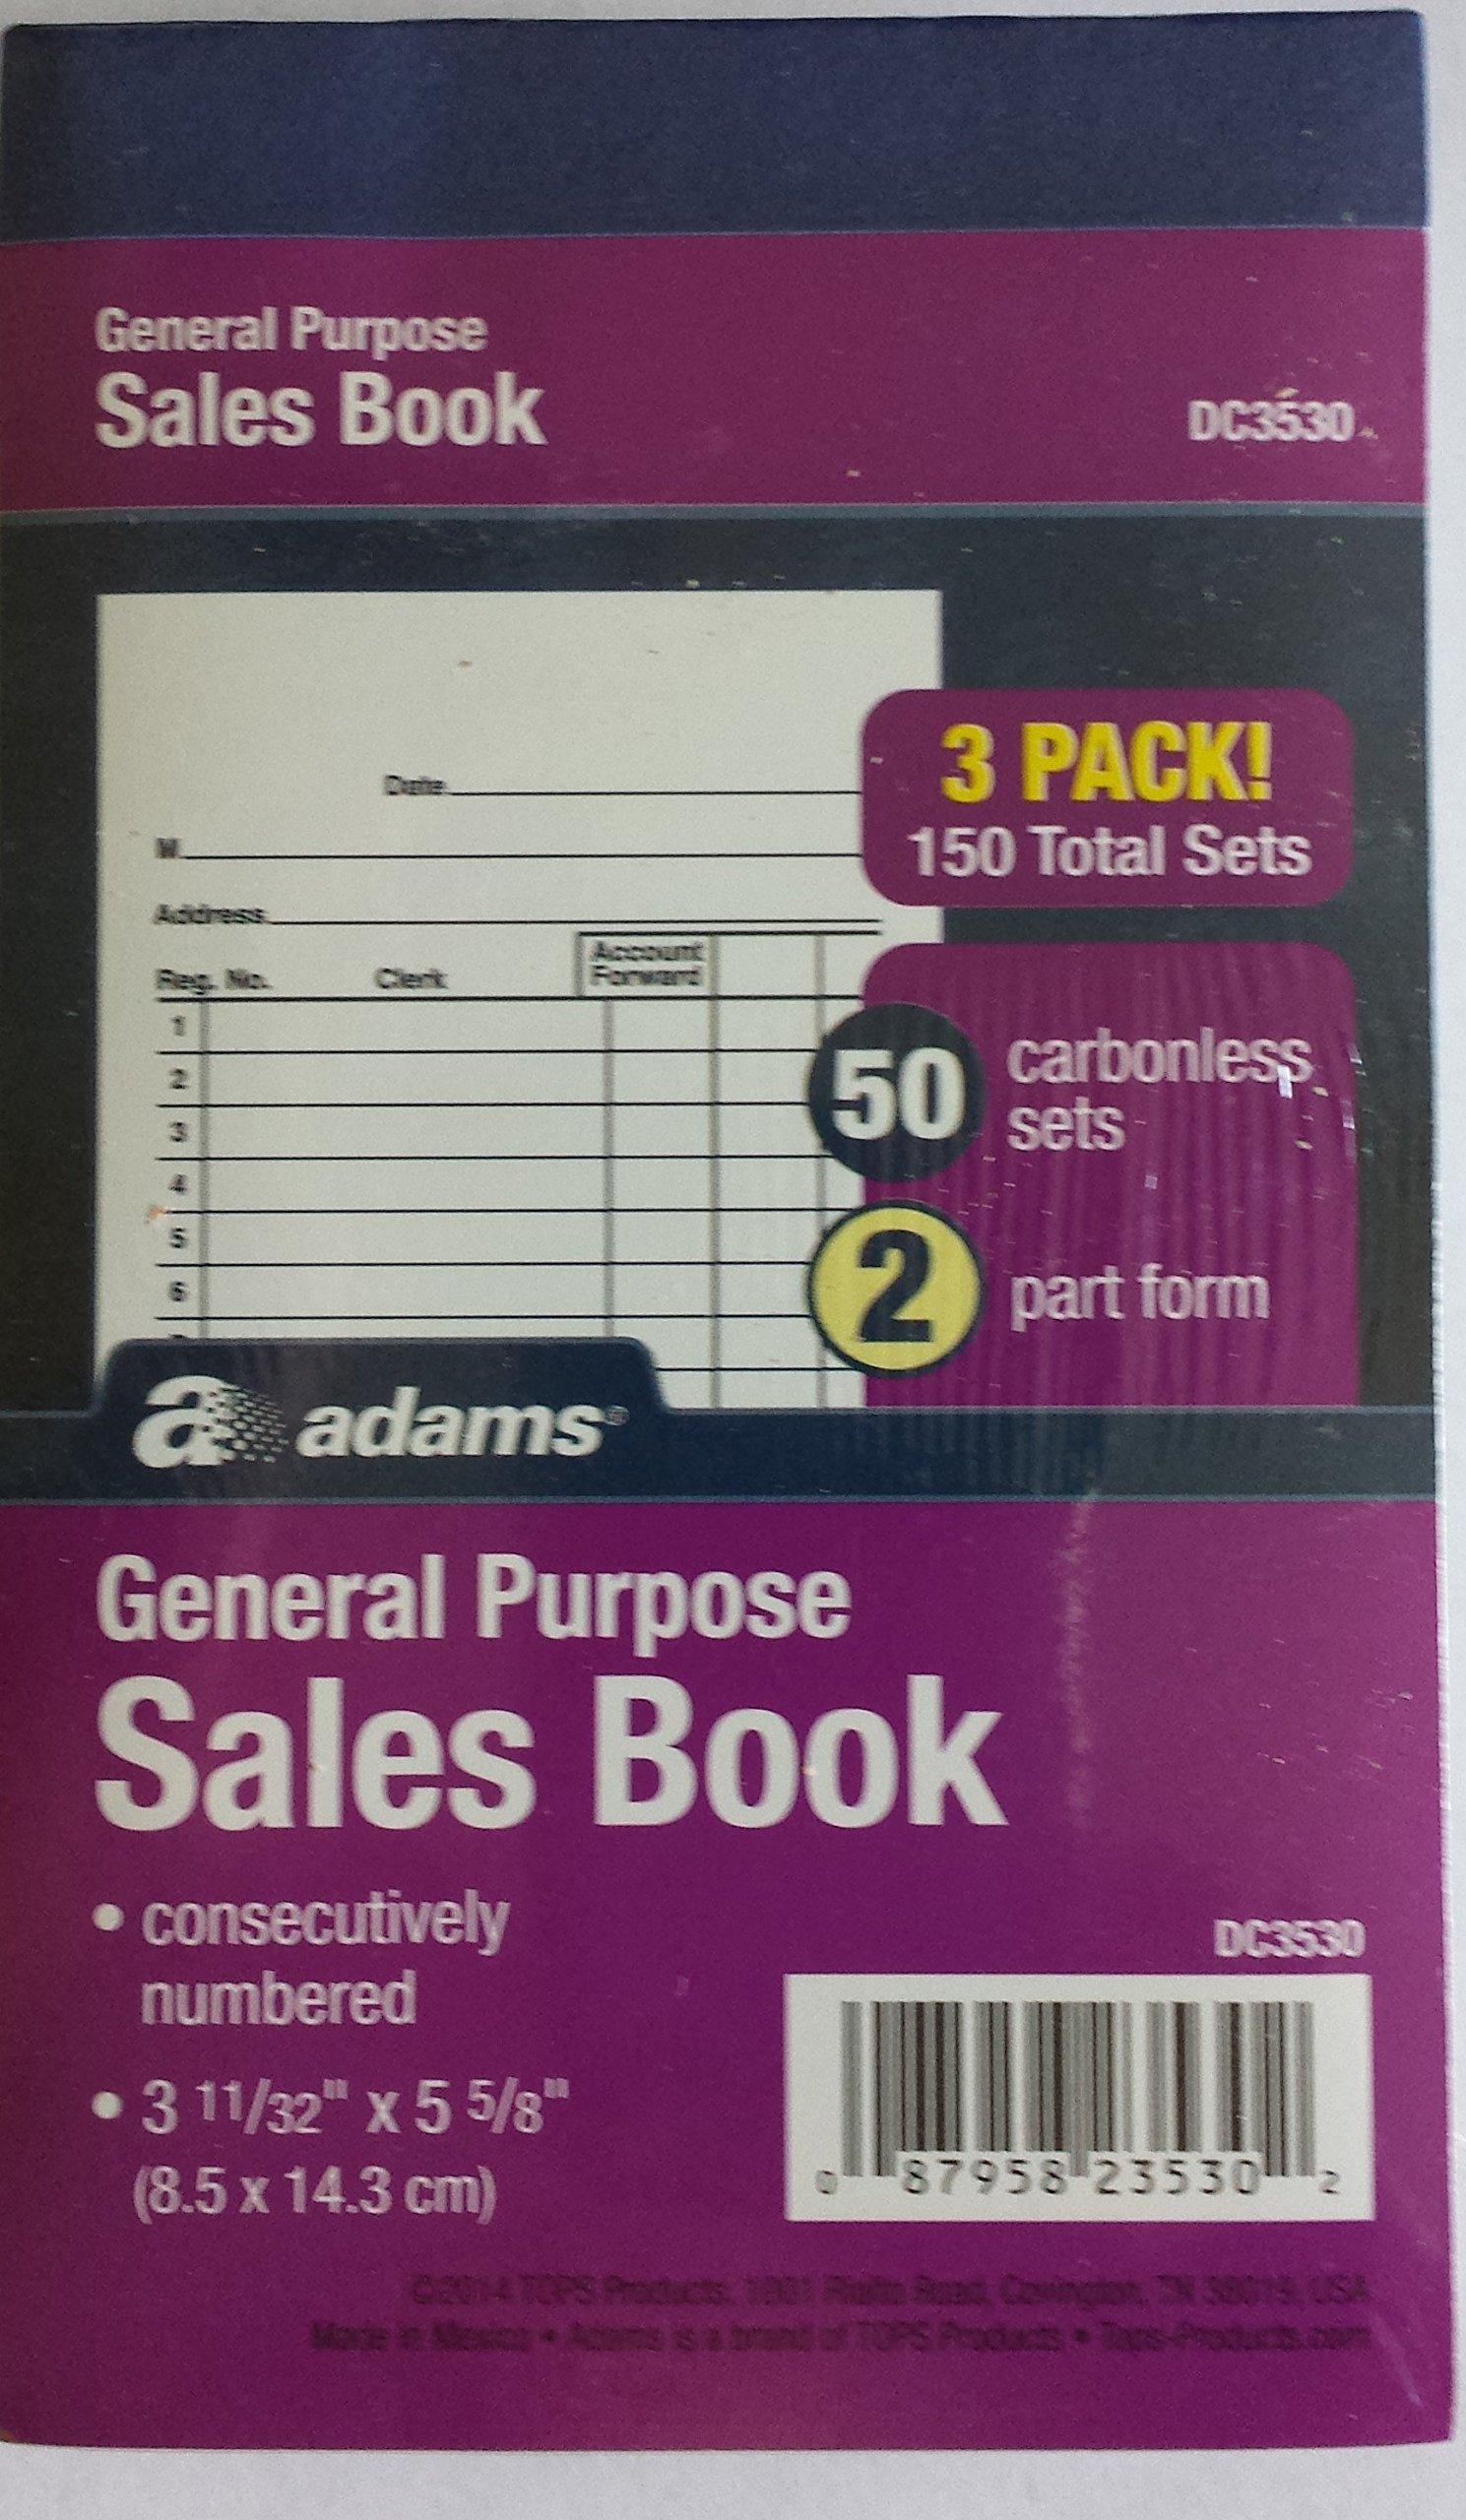 Adams General Purpose Sales Books, DC3530, Case of 18